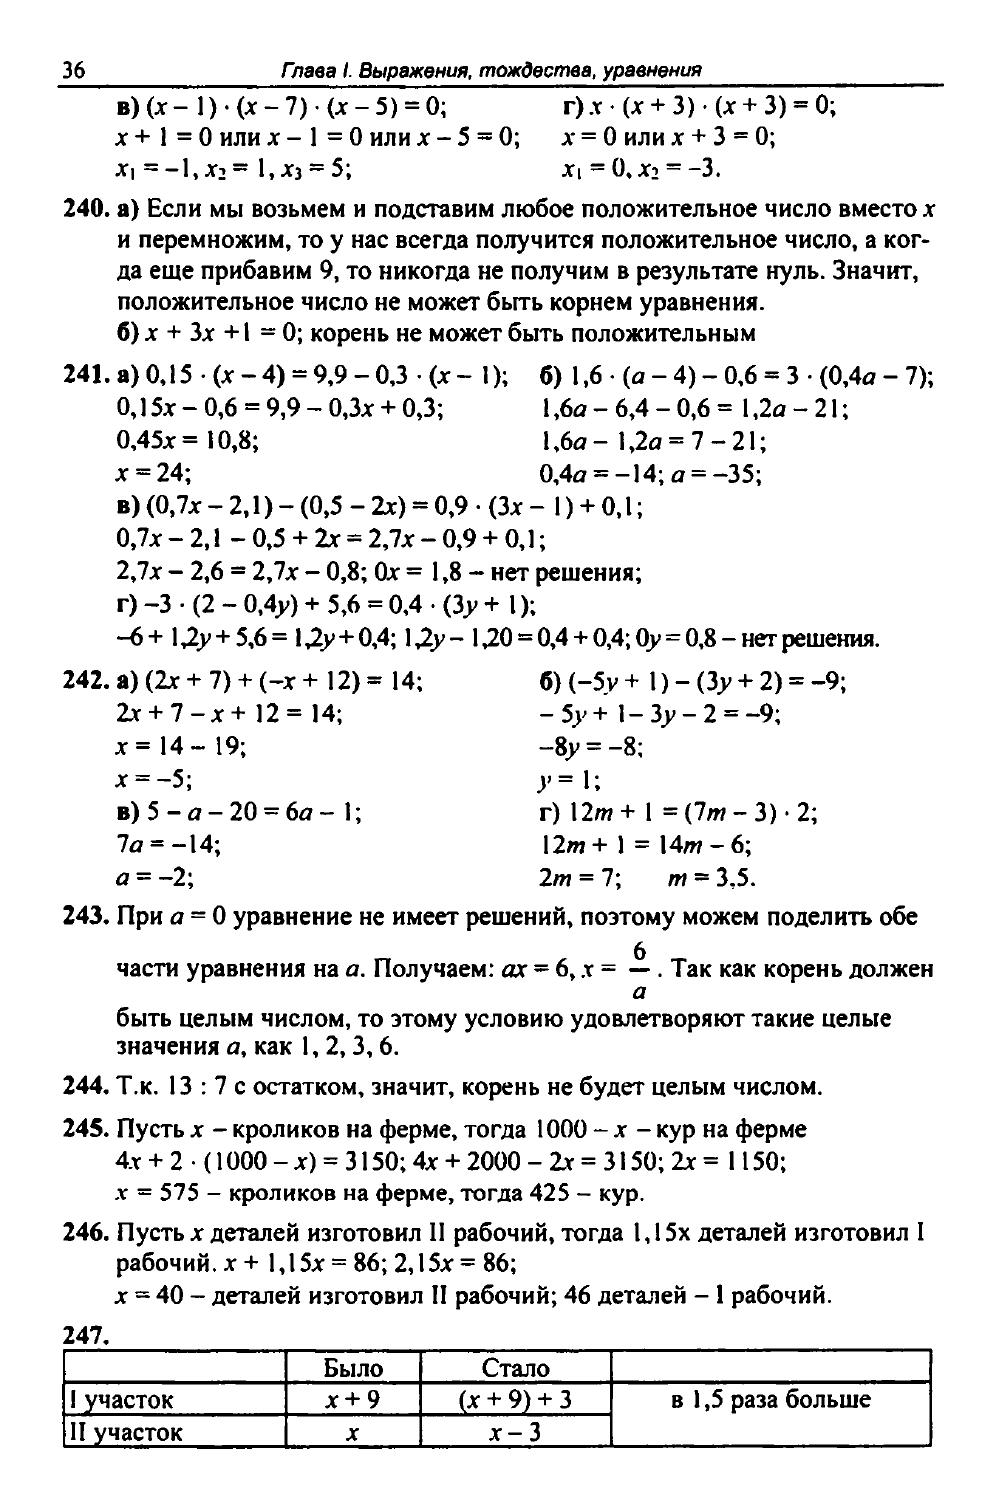 Решебник за 7 класс по алгебре 14 фотография